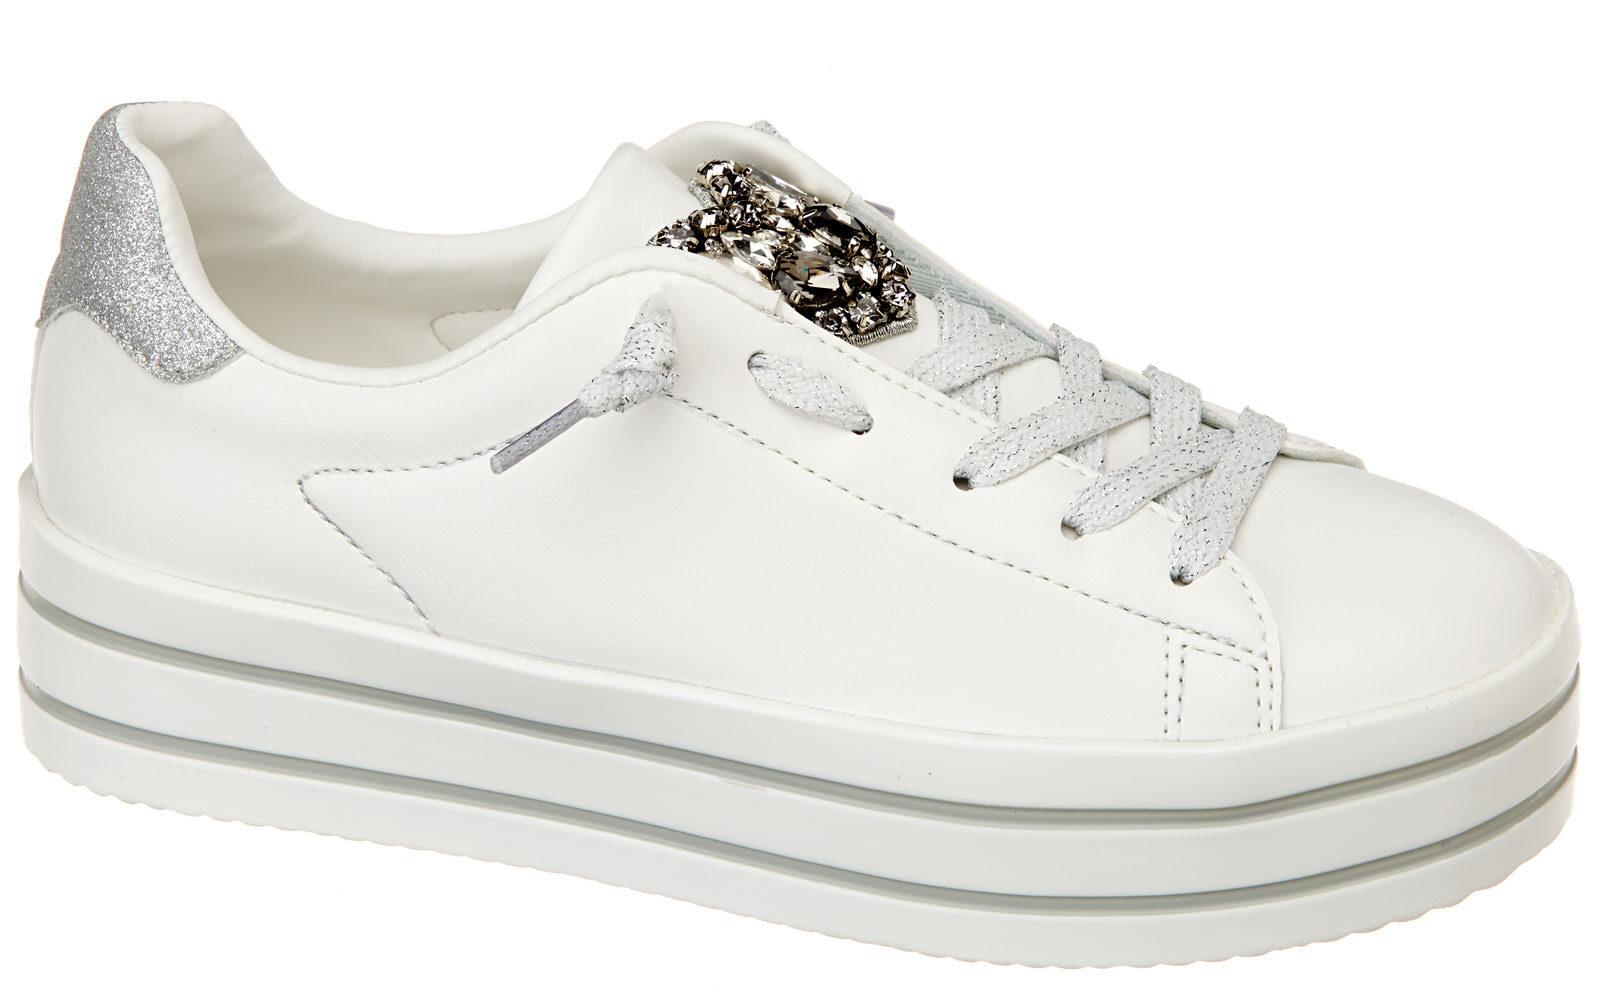 Sweet-years-Sneakers simil pelle con decorazione glitter 49,90 euro